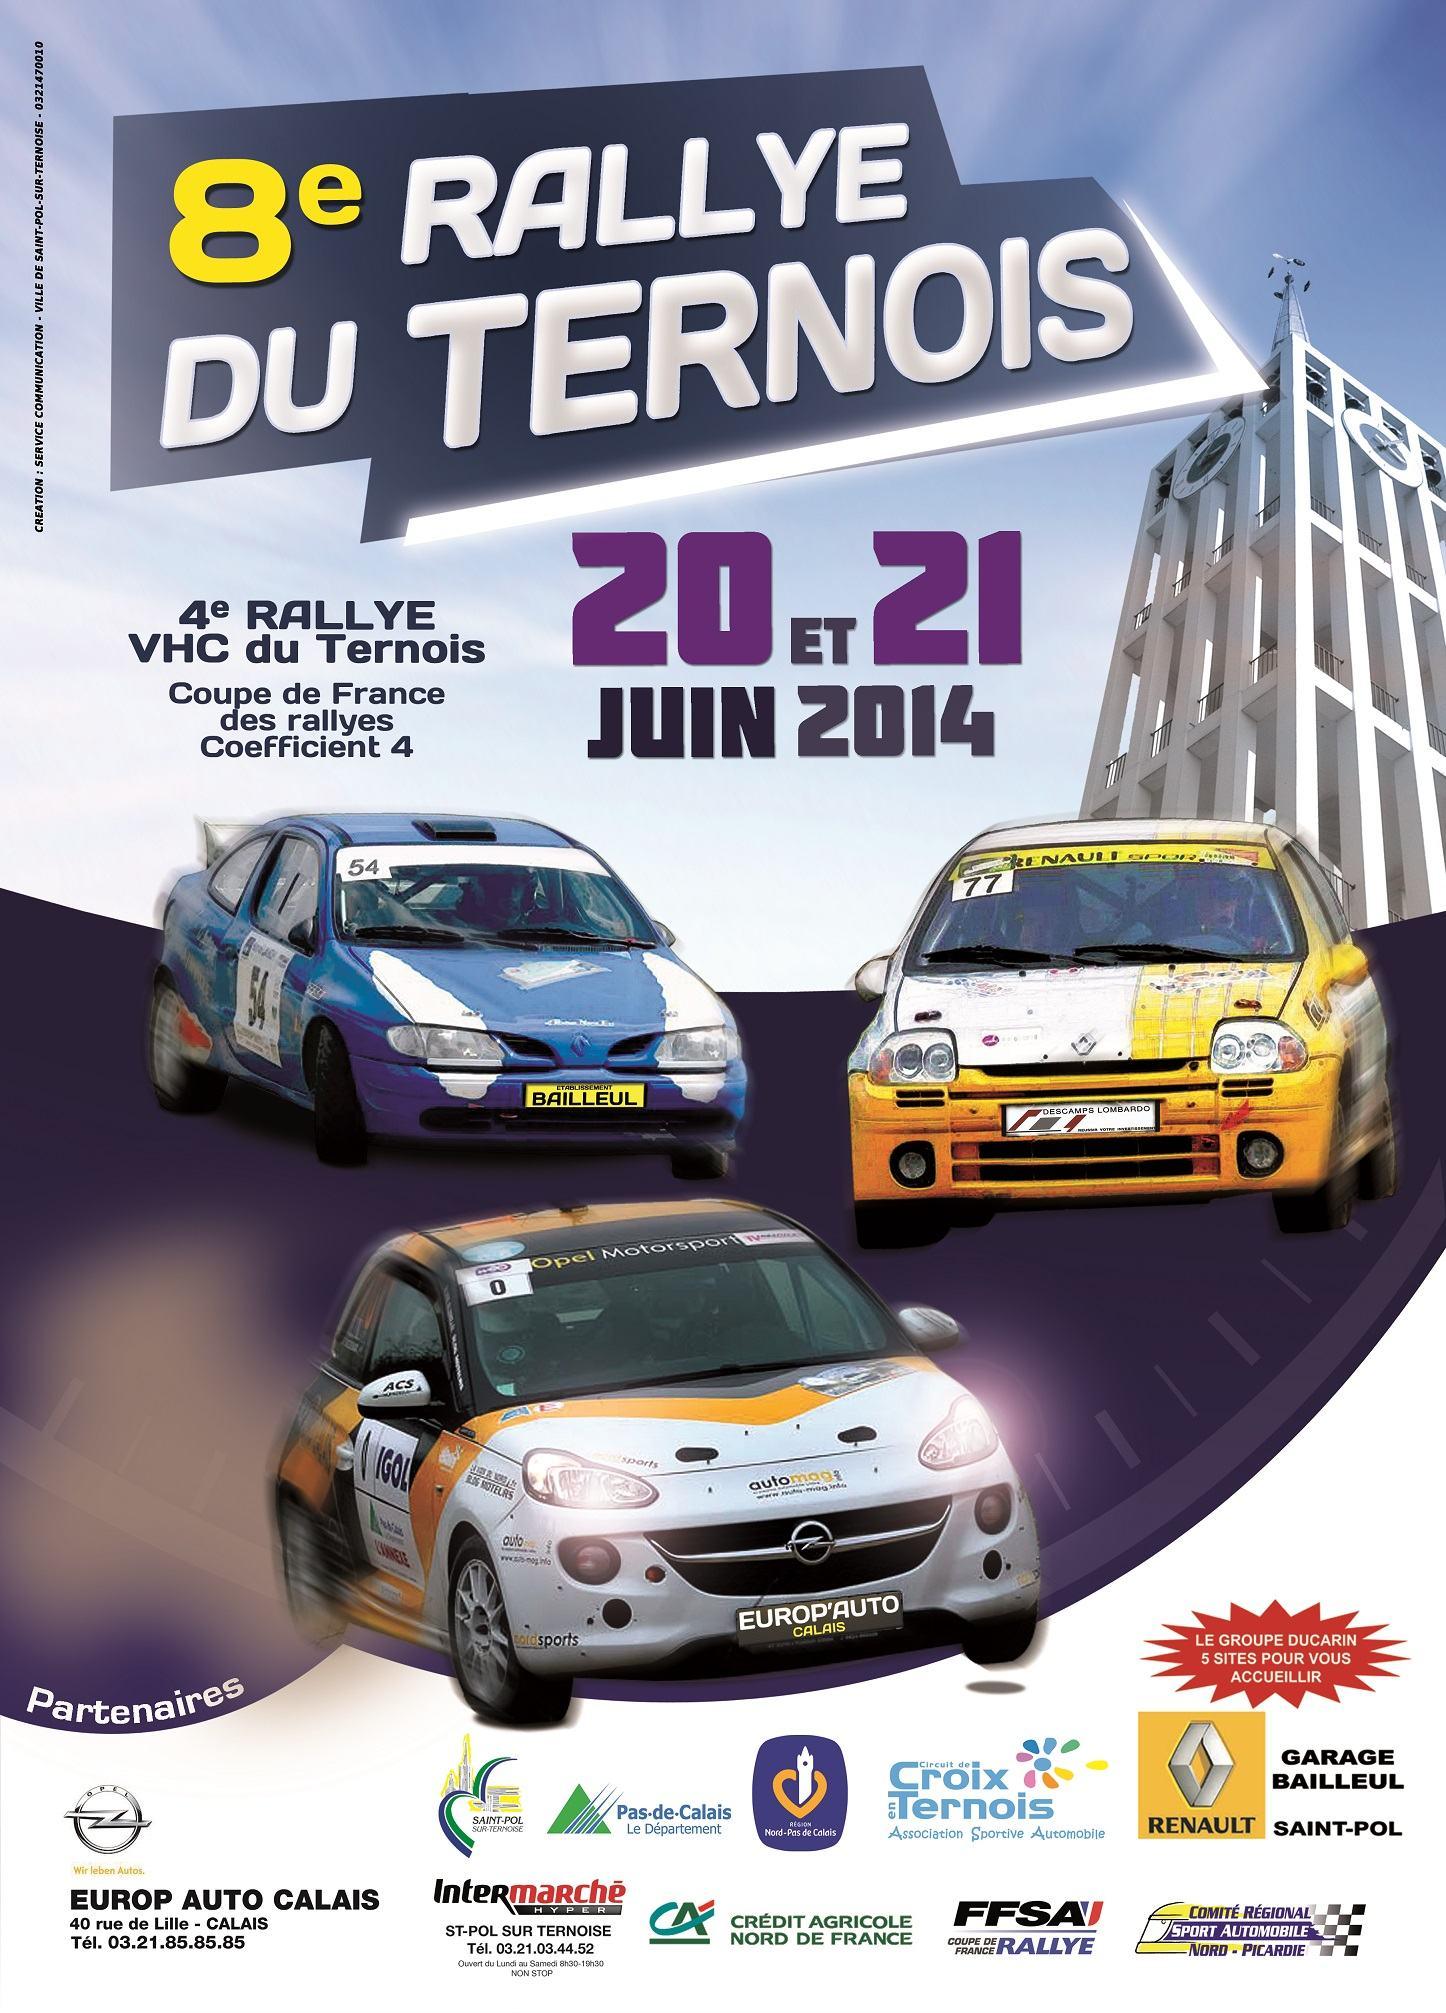 Rallye-du-Ternois-2014